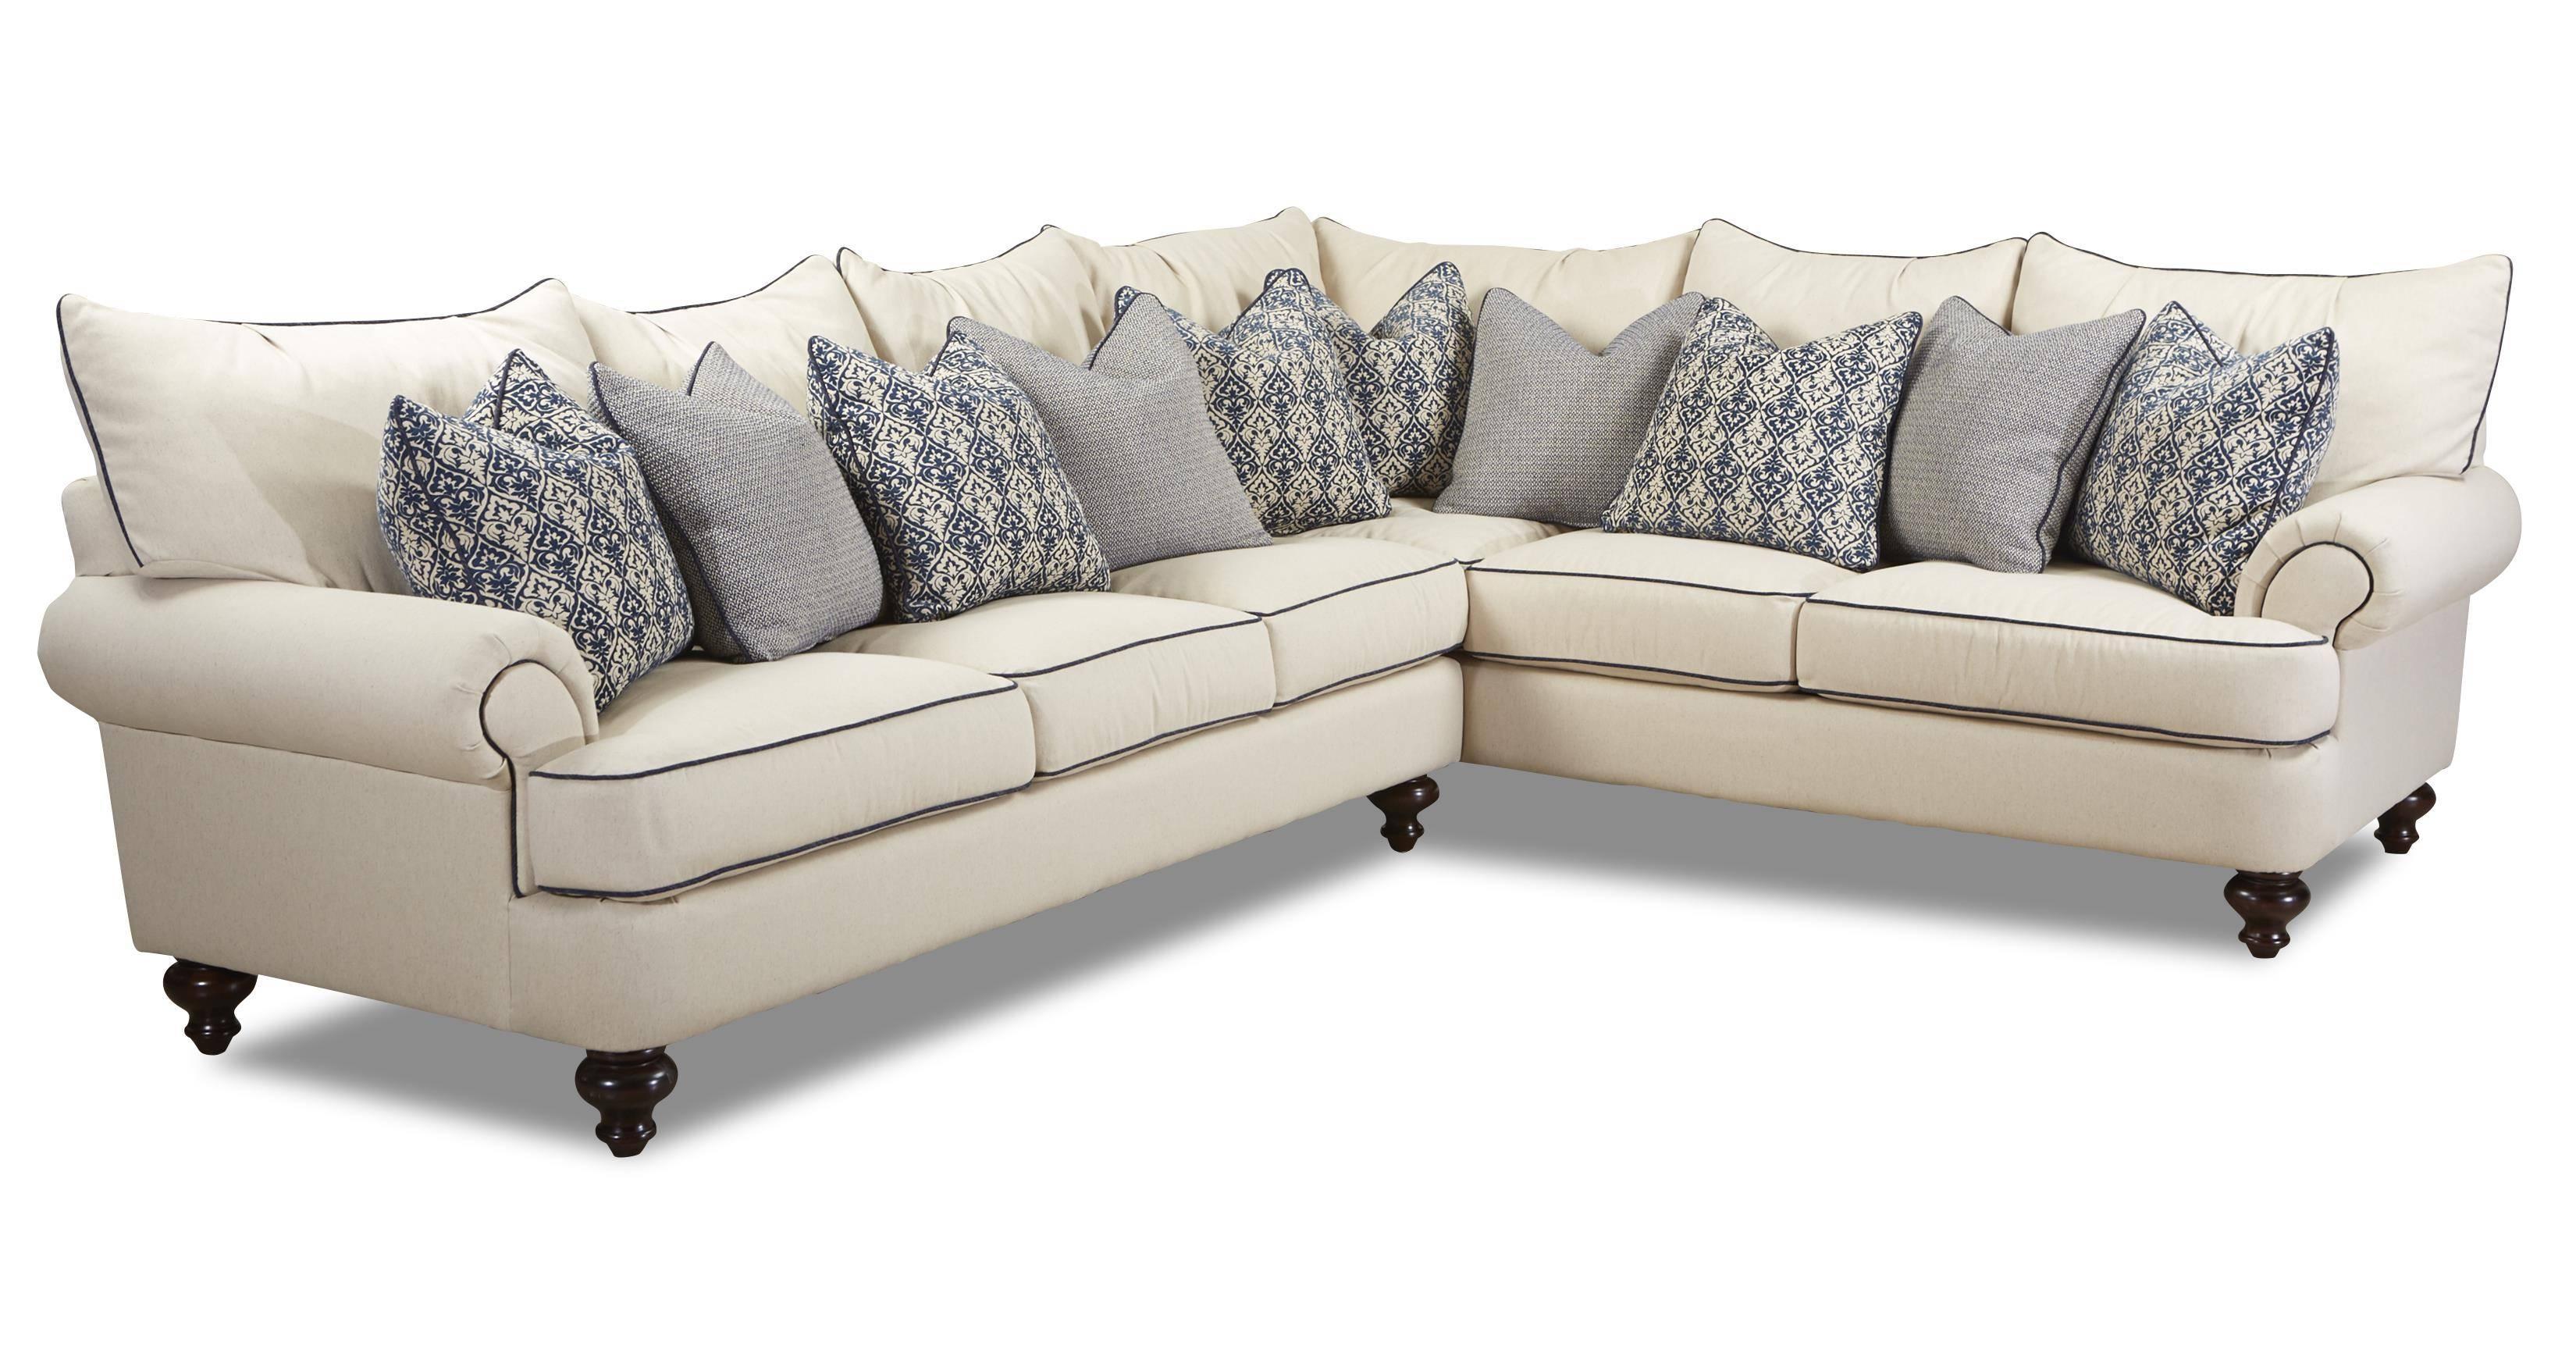 chic sofa set mid century modern leather sofas 30 inspirations of shabby